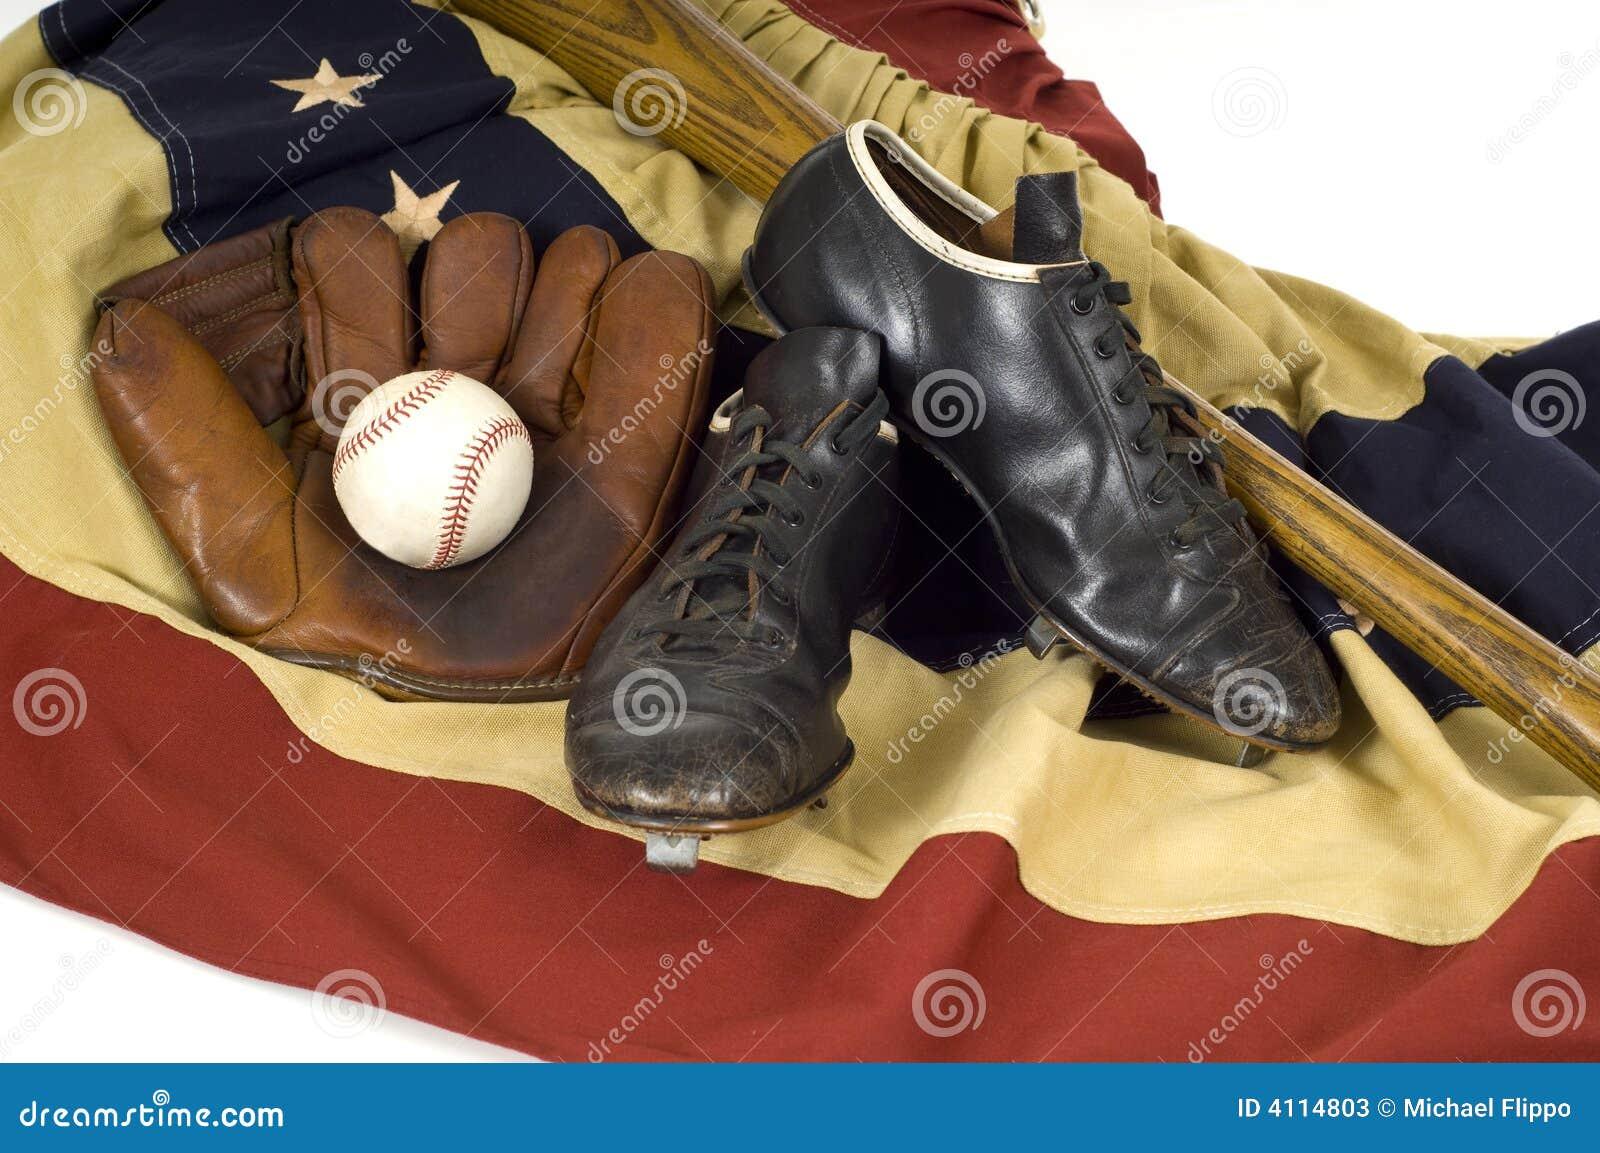 Vintage Baseball Gear Stock Photos Image 4114803